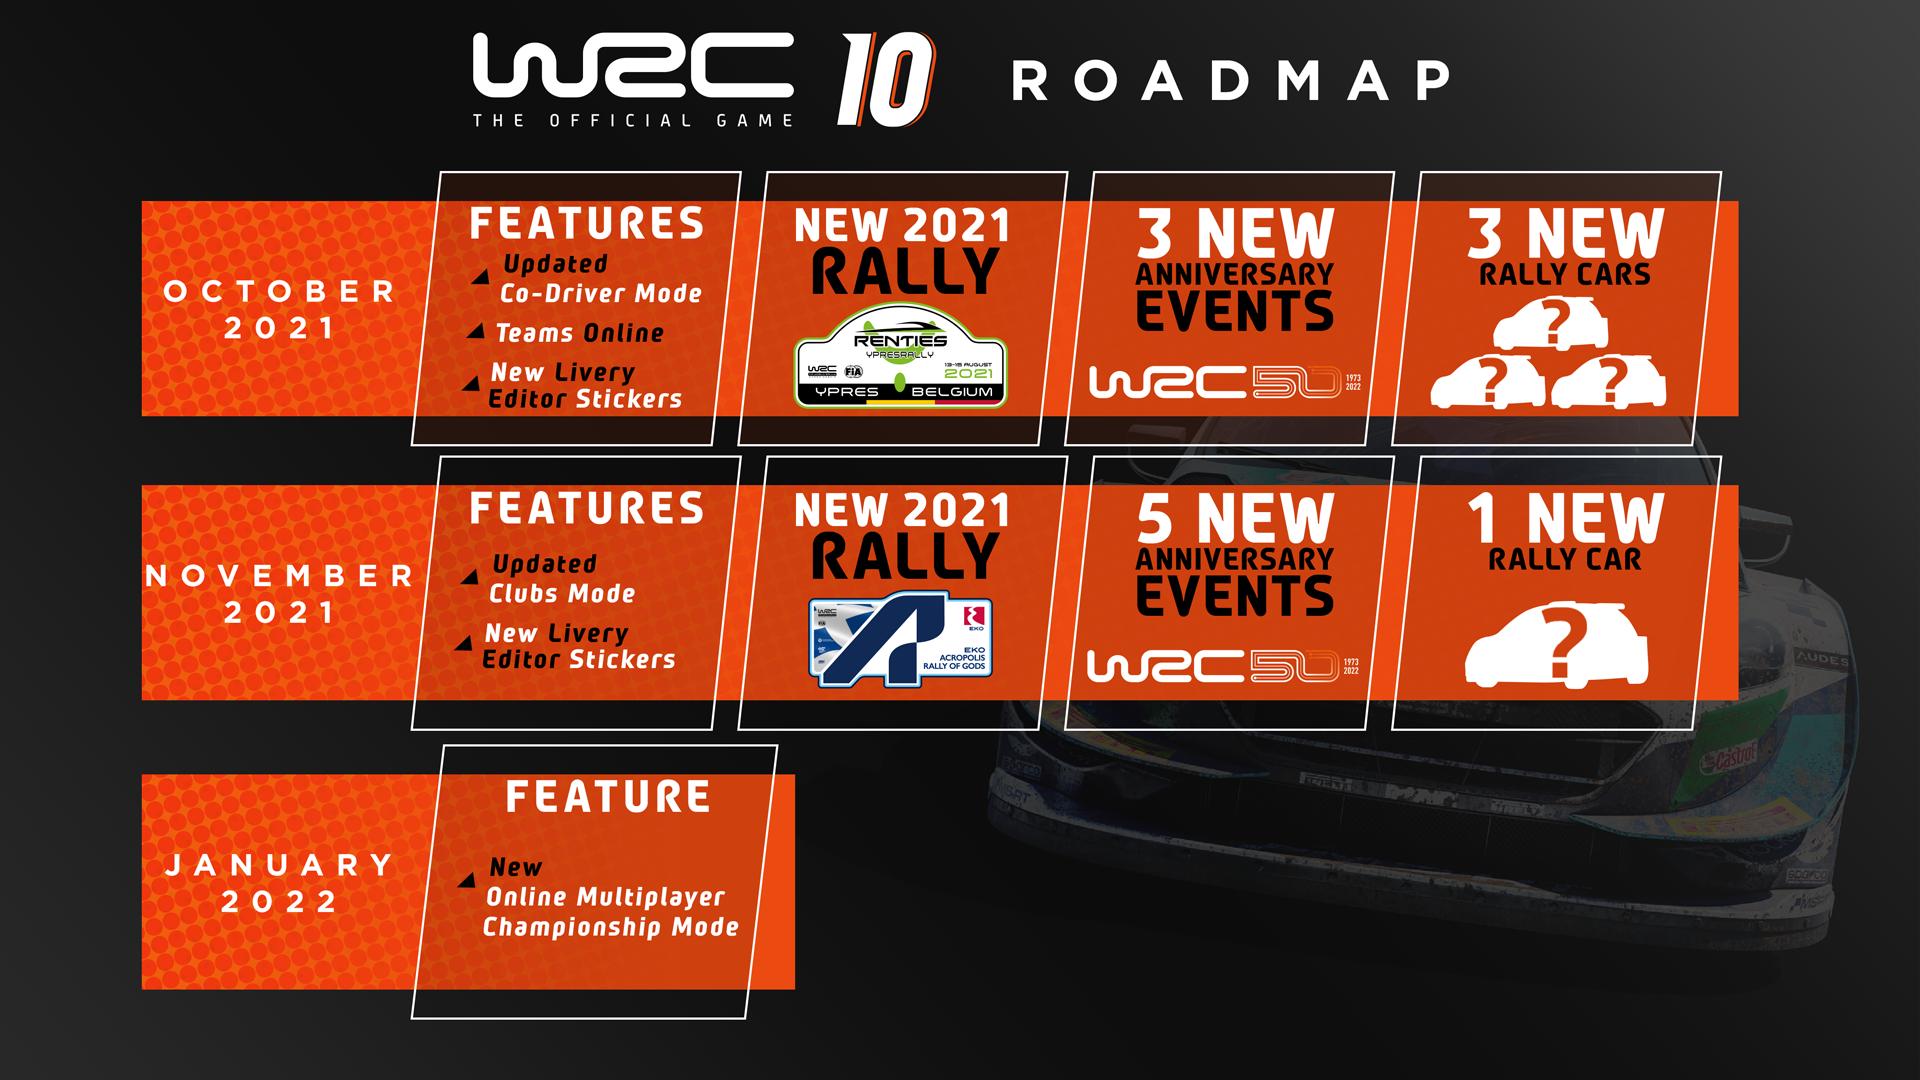 wrc 10 roadmap